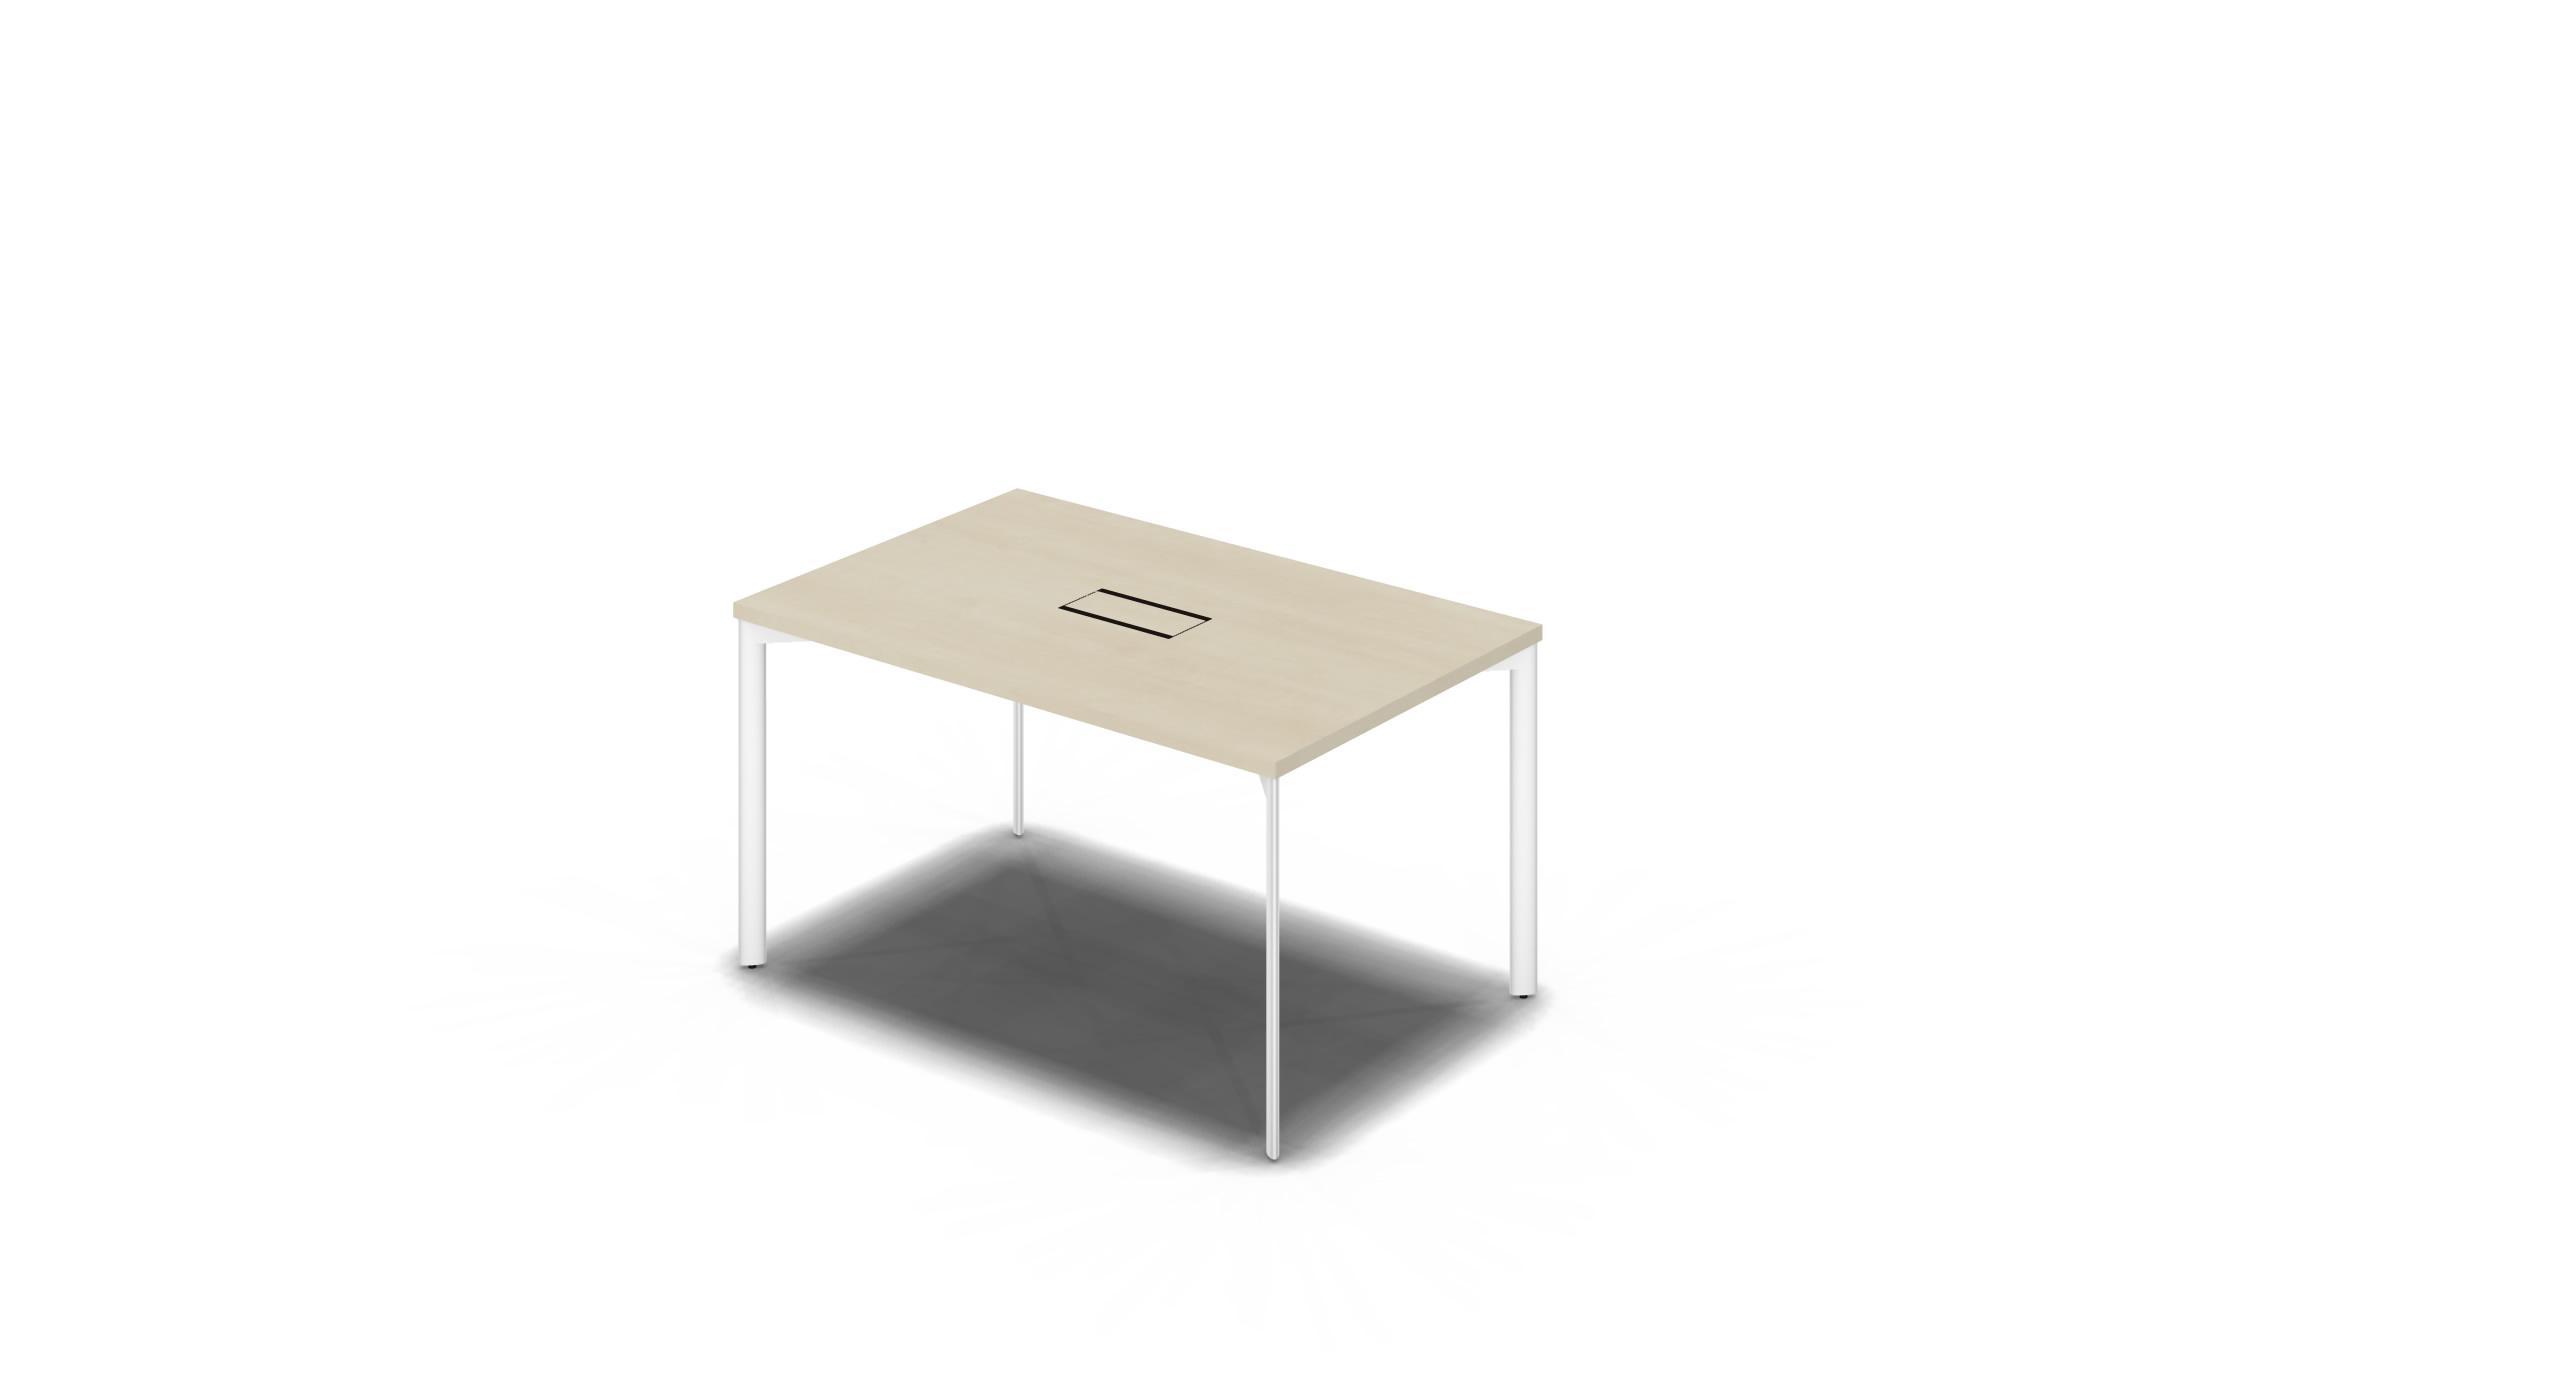 Table_Slim_1200x750_White_Maple_withOption